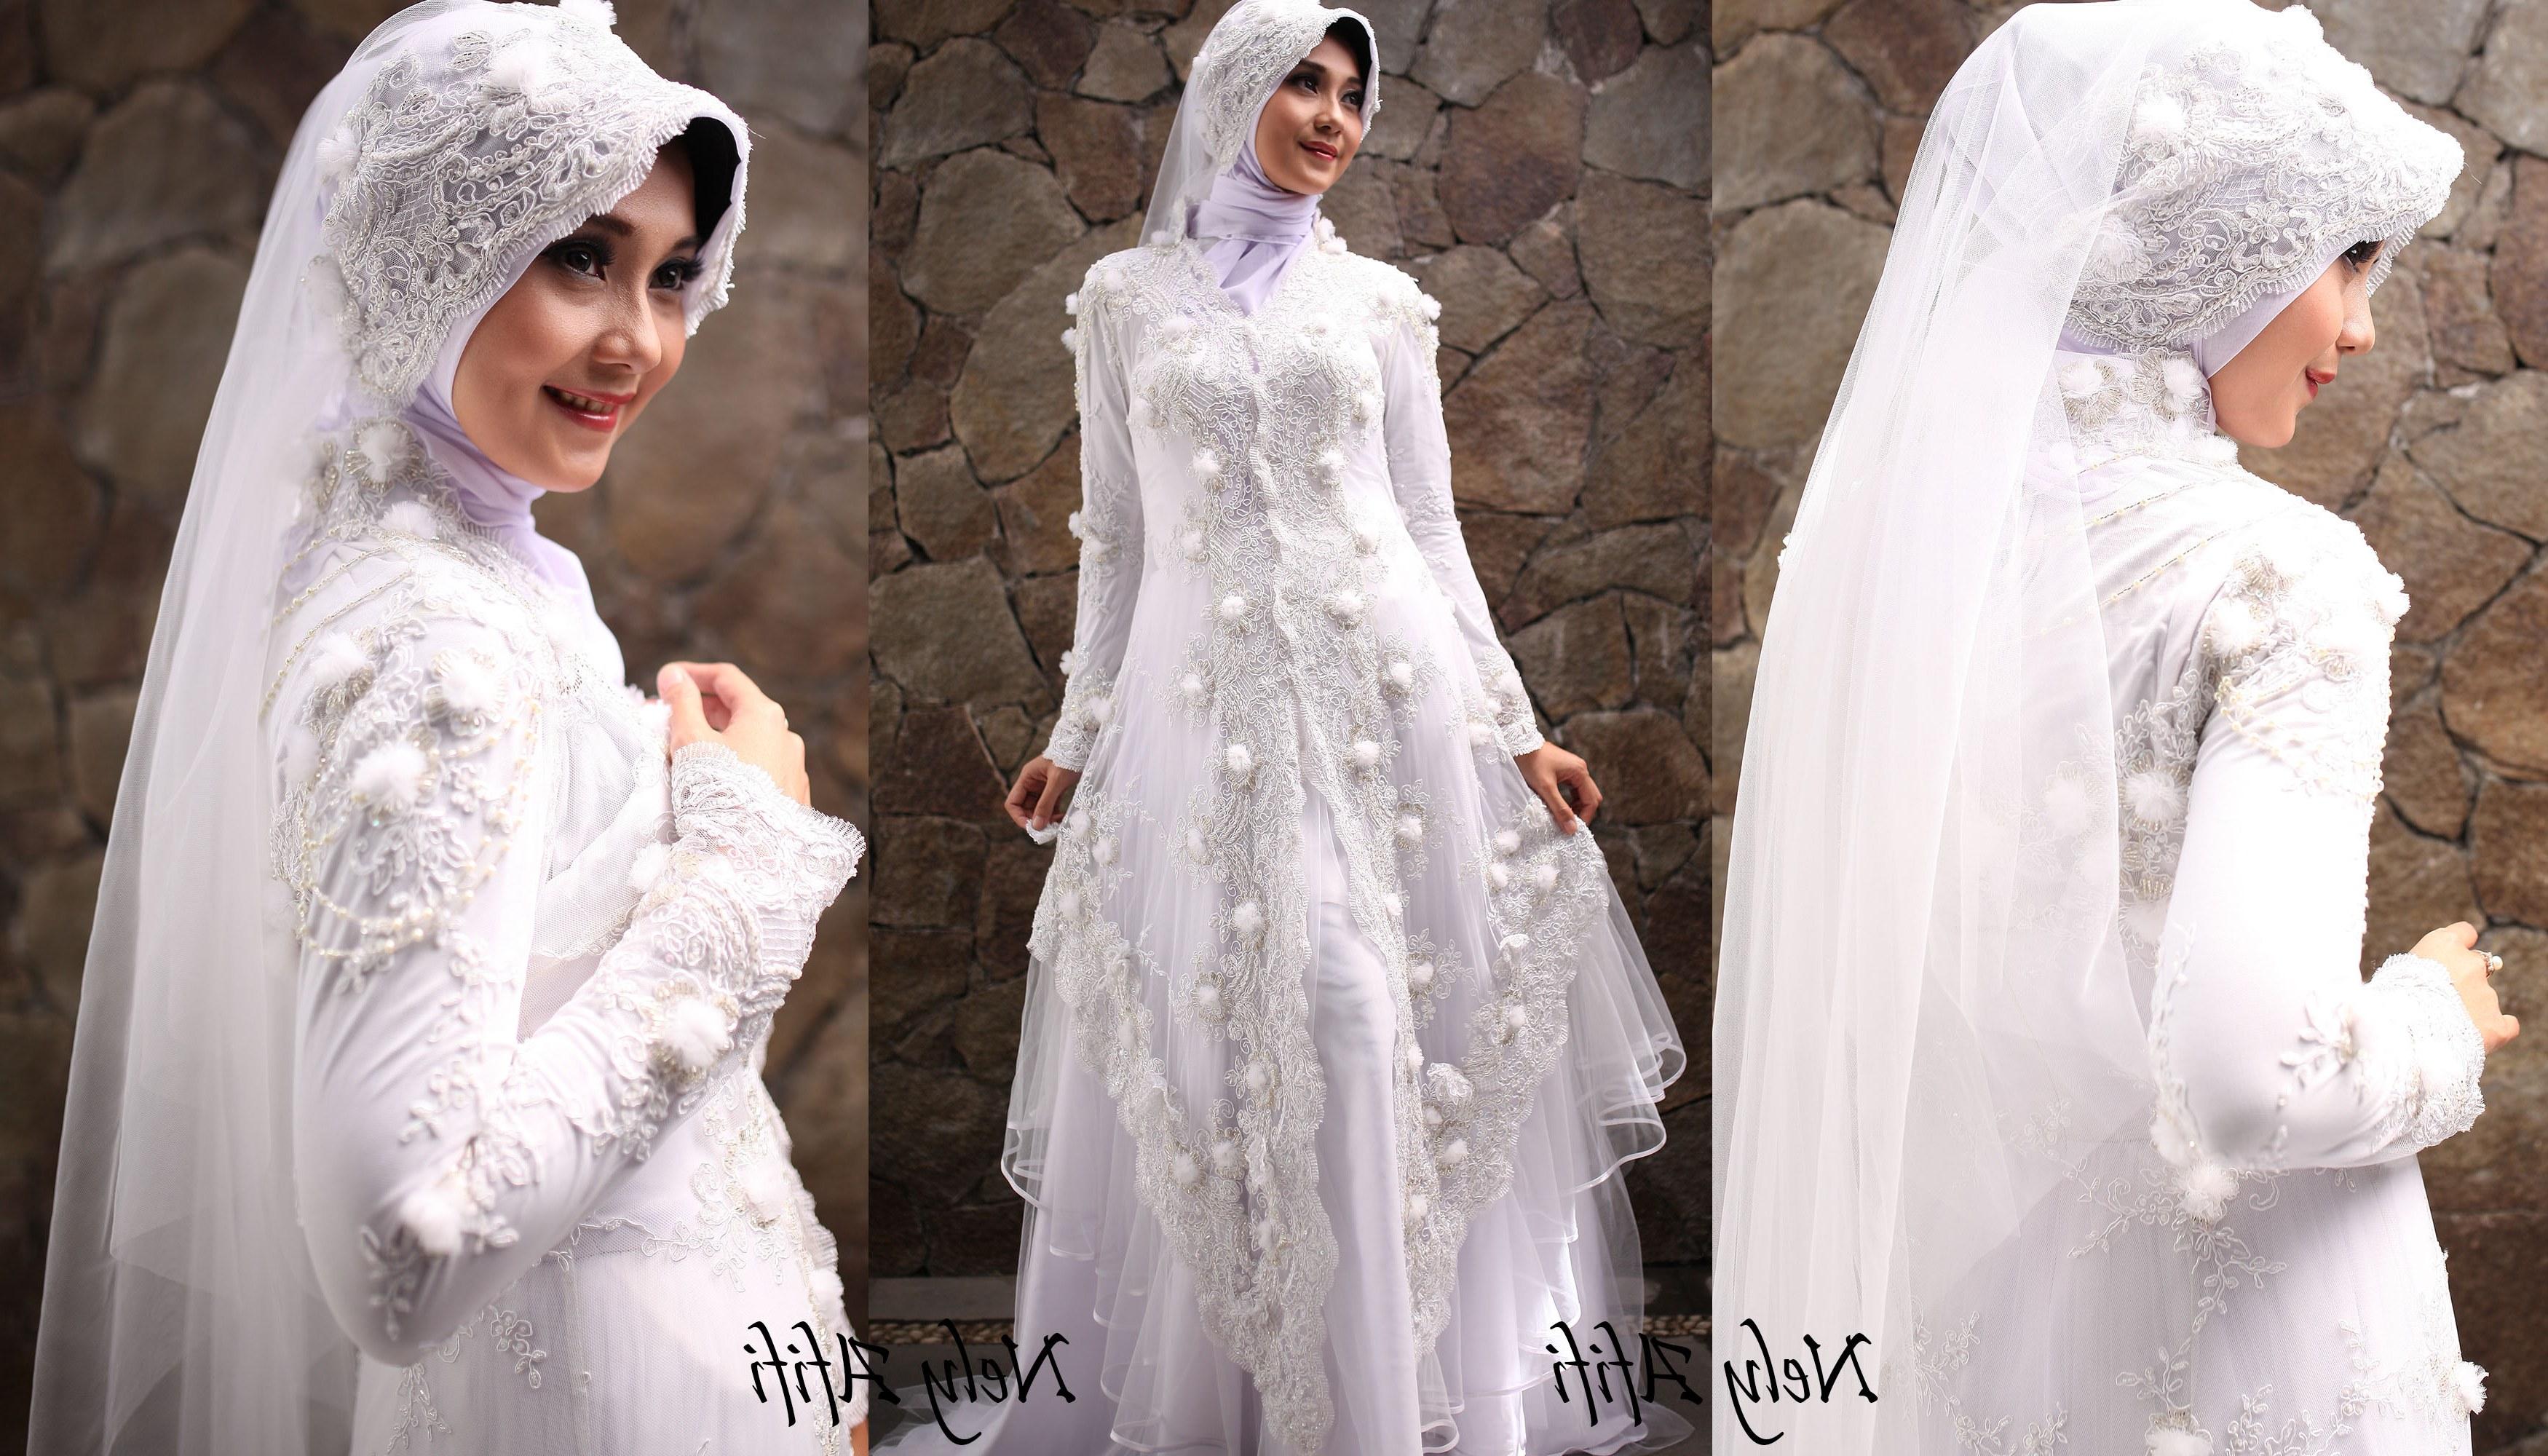 Model Sewa Baju Pengantin Muslimah Modern Qwdq Gaun Pengantin Muslimah Kebaya Modern Brocade Putih